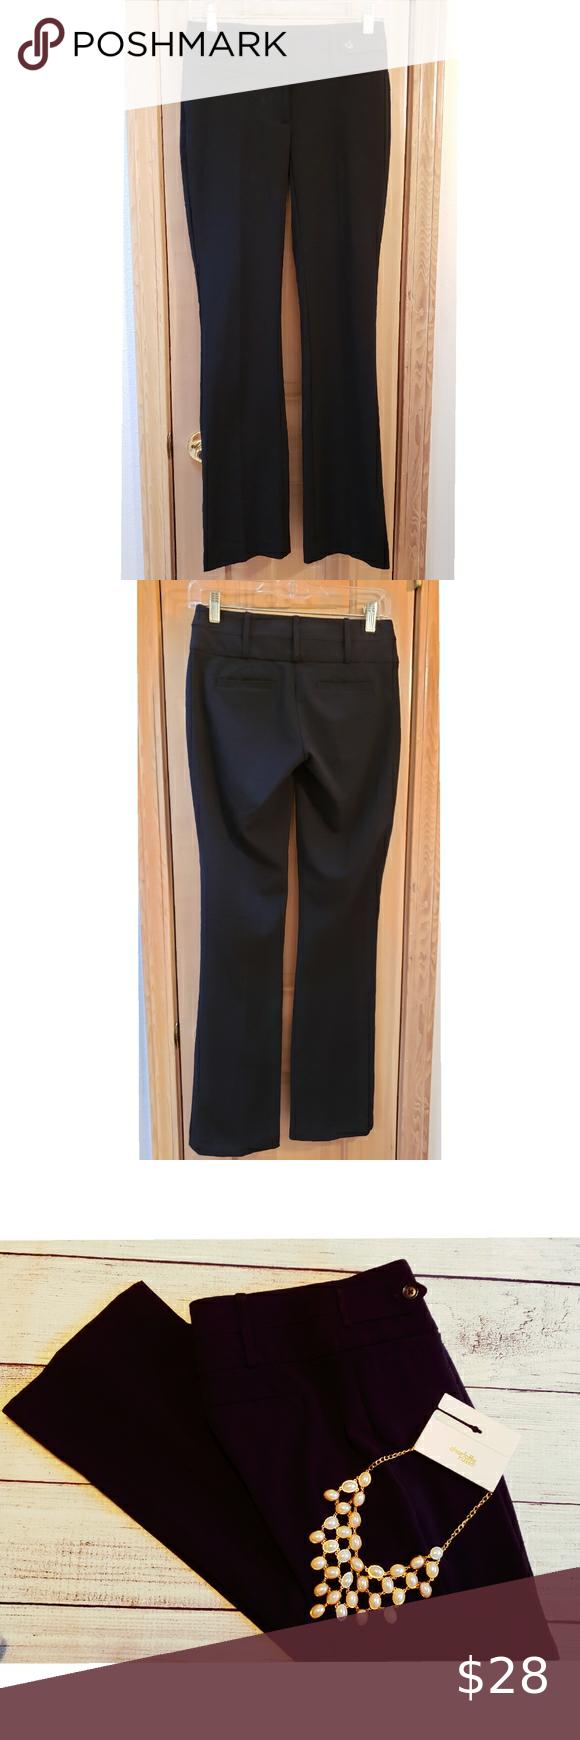 38+ Candies junior dress pants ideas